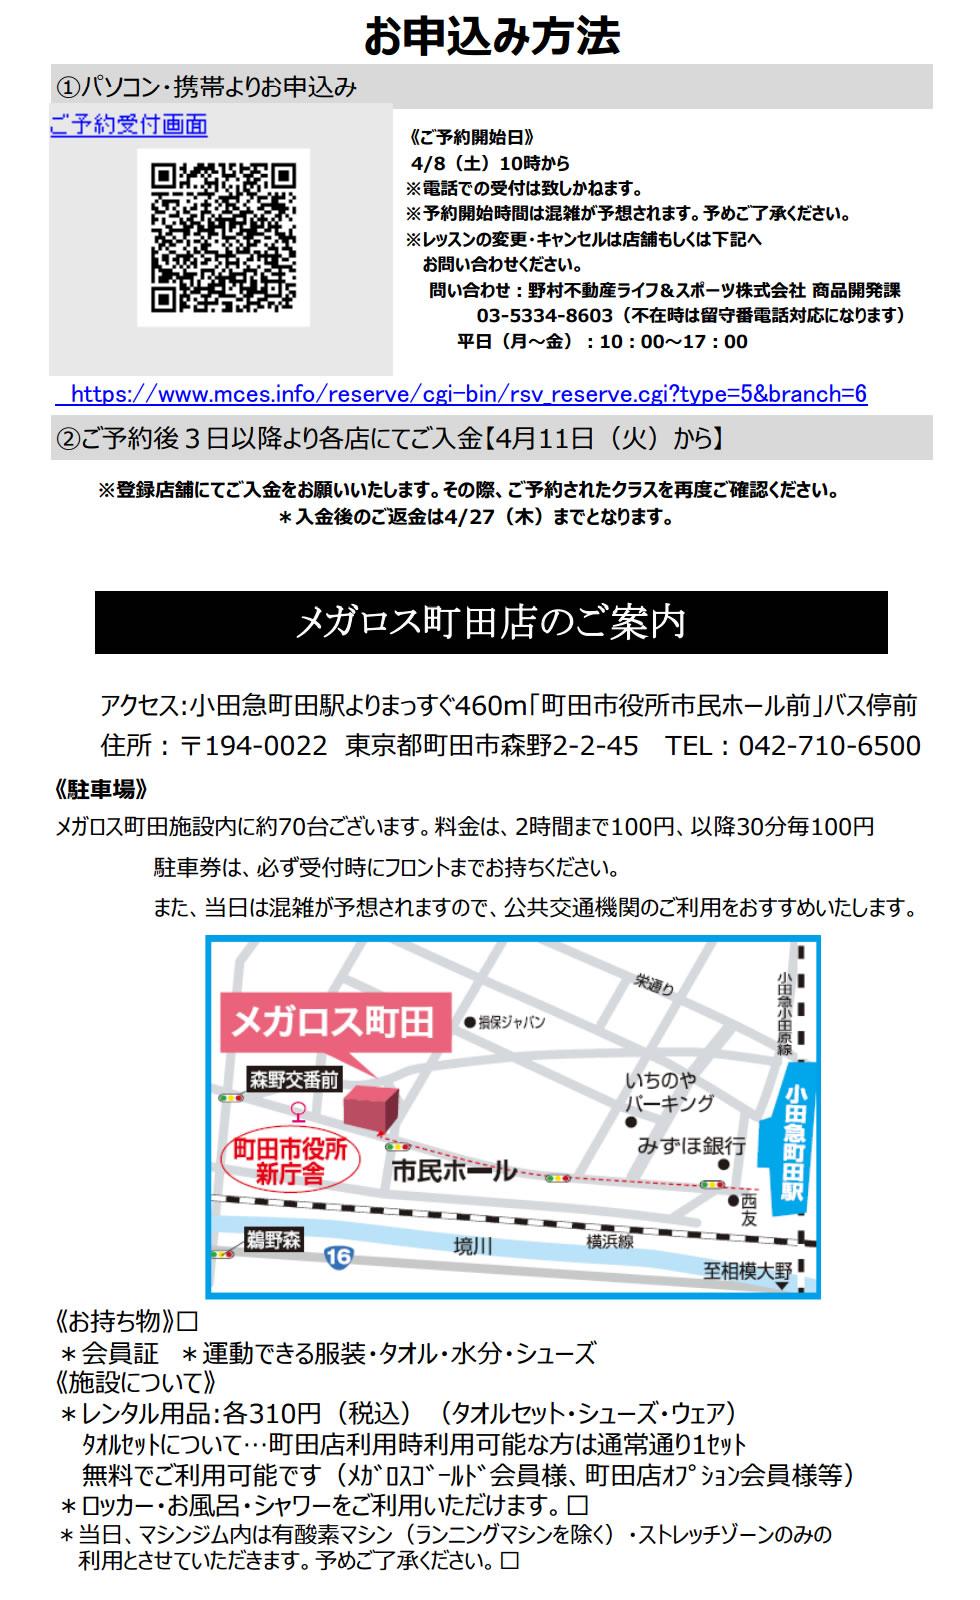 POP2/【5/5金】MEGALOS MOSSA FES 2017【メガロス町田】東京